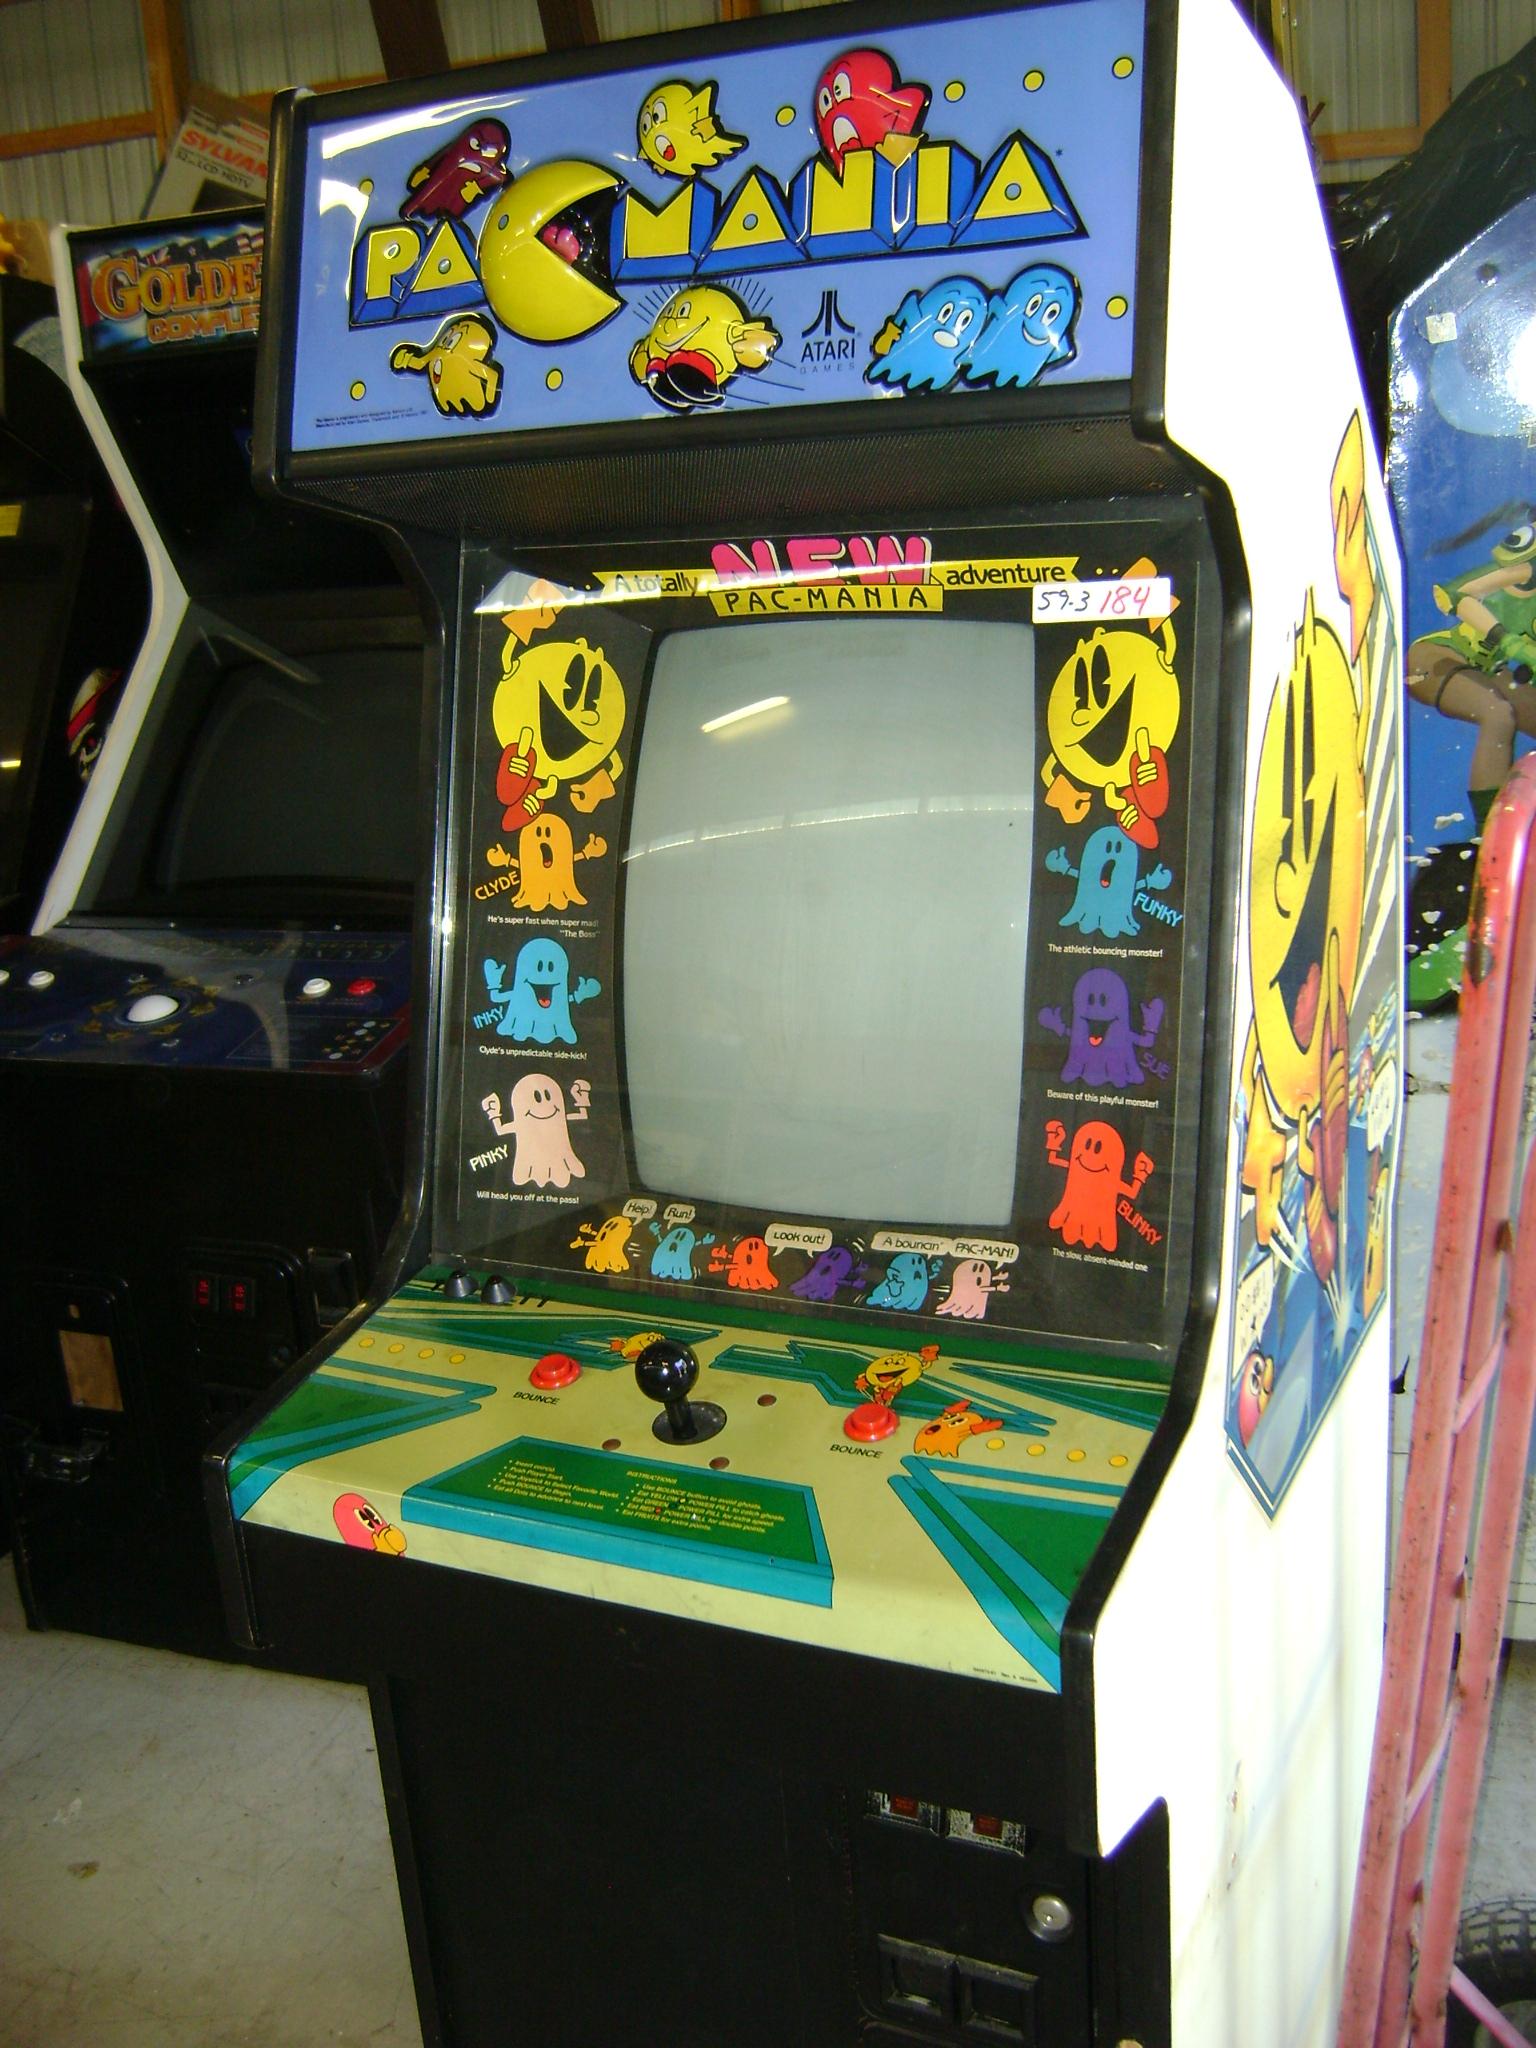 Pacmainia arcade machine